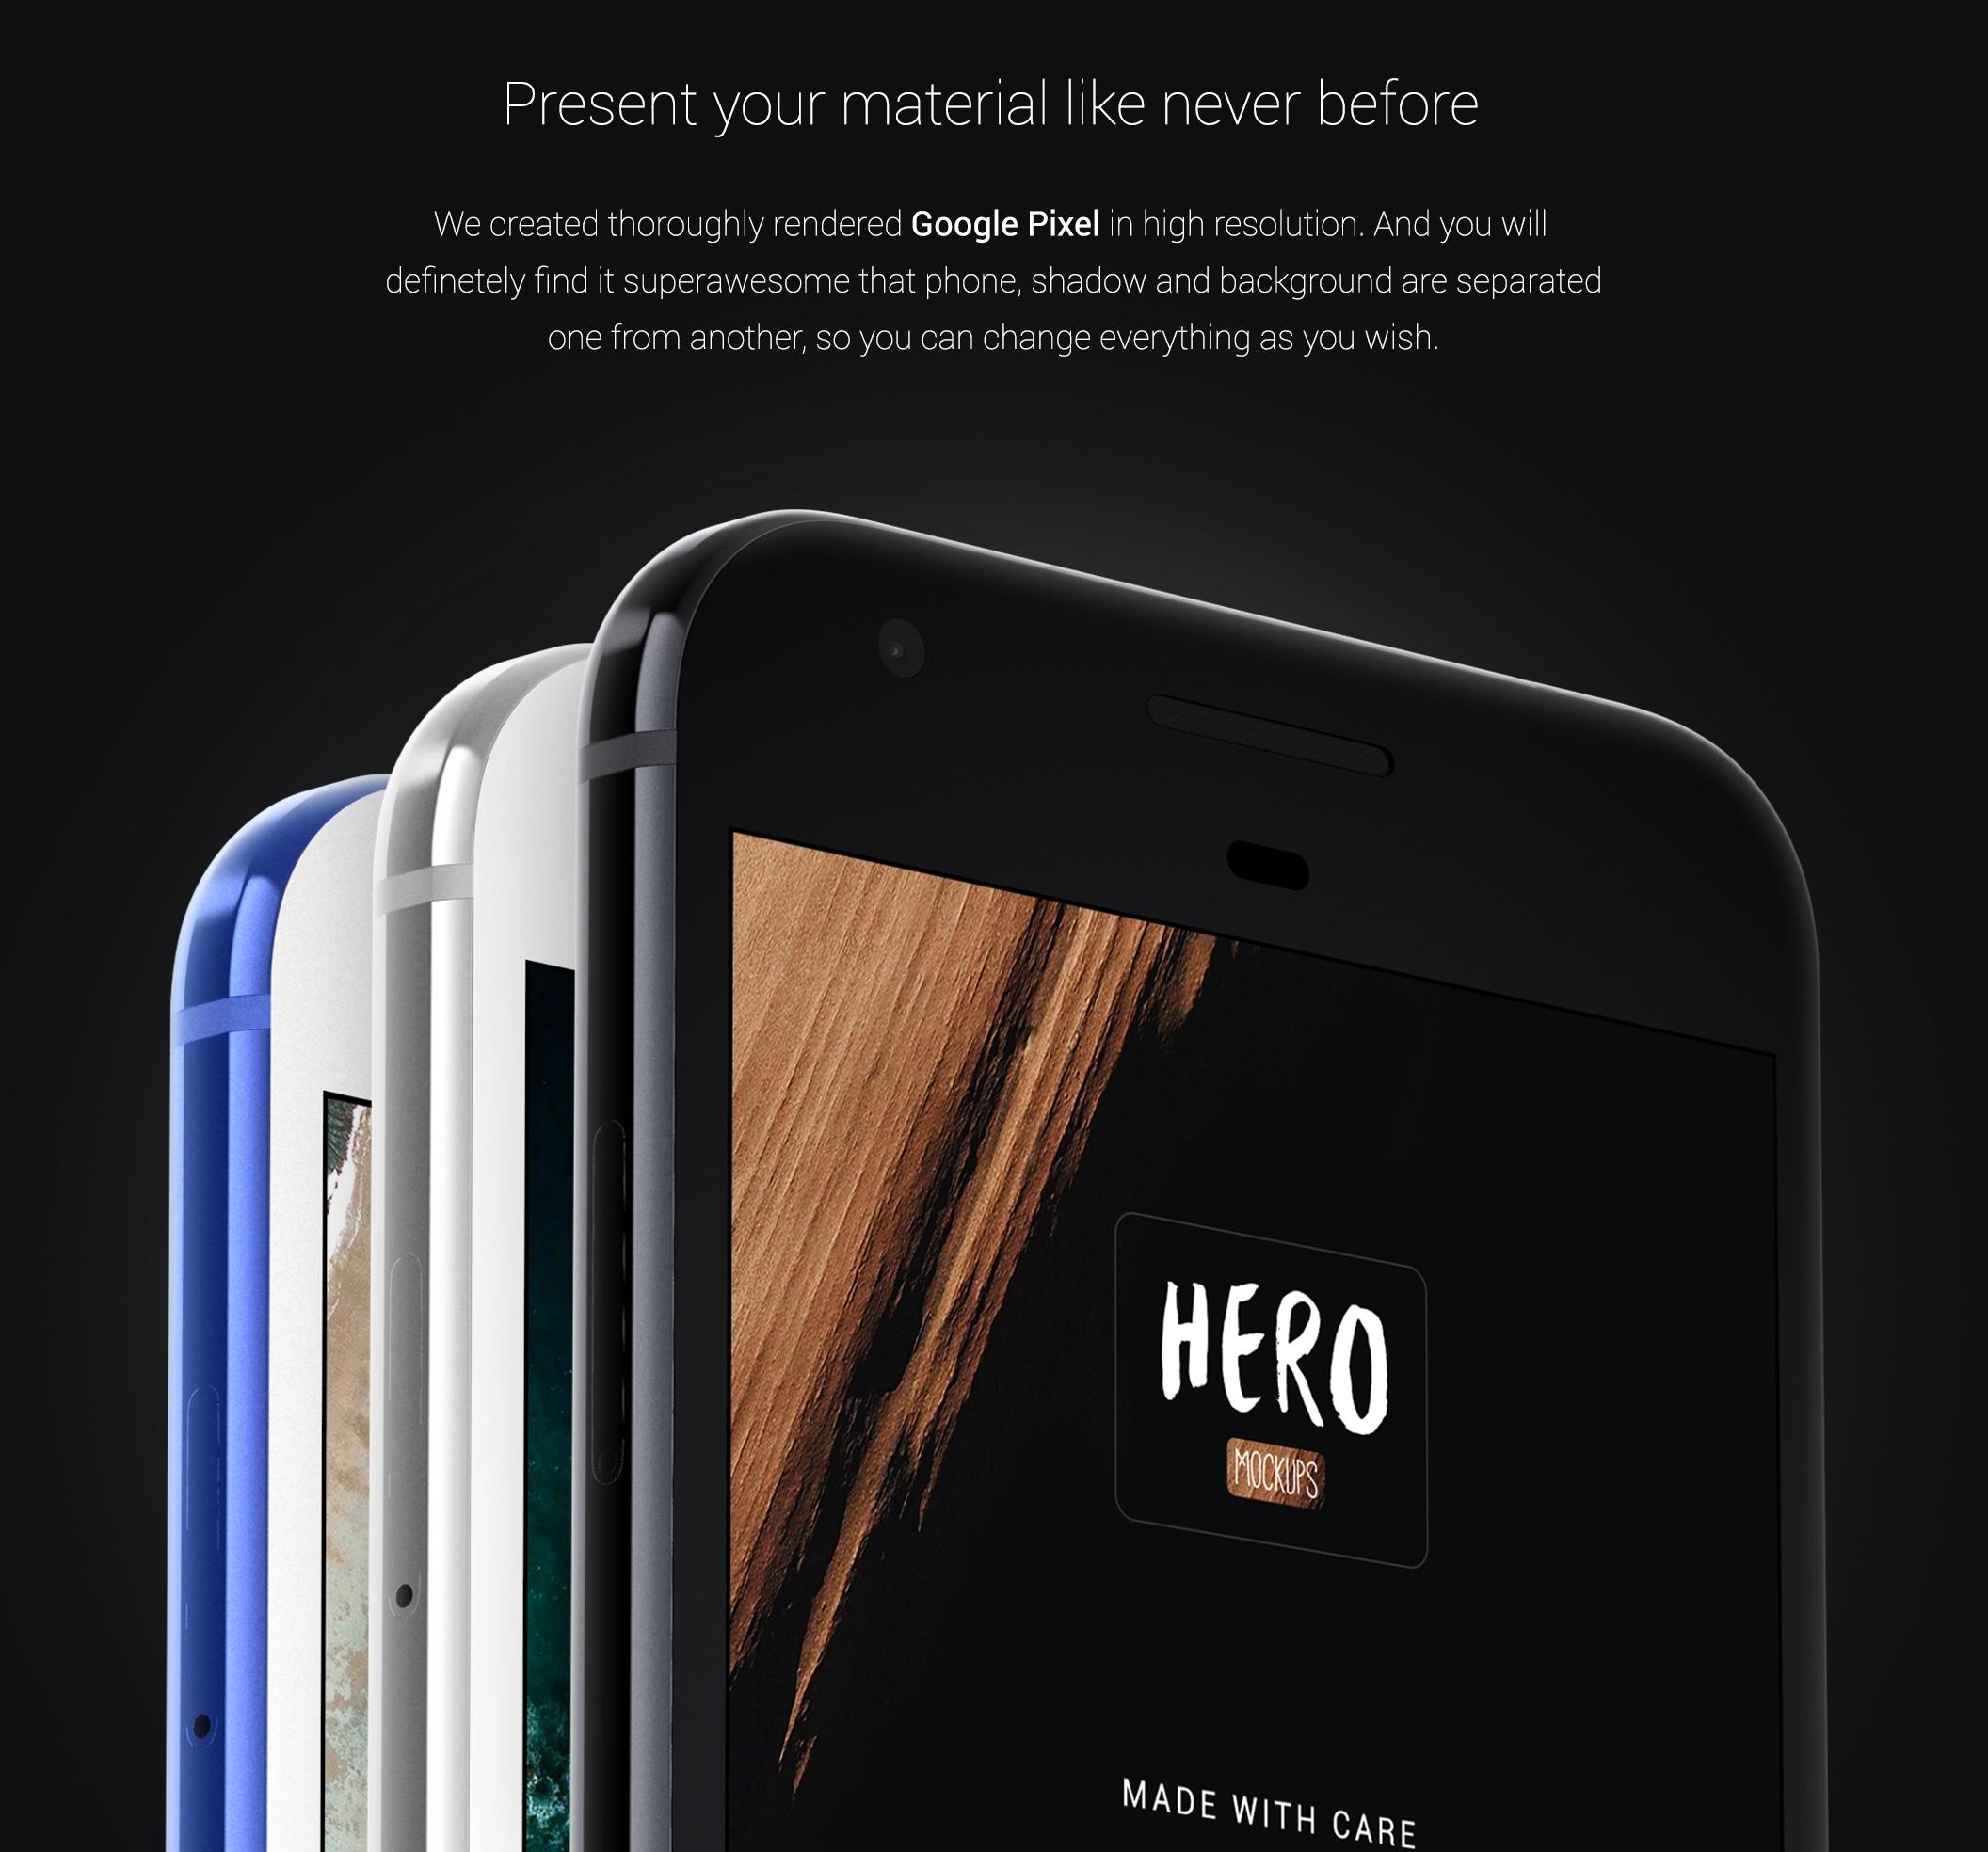 [VIP专享]HERO Google Pixel Mockups样机素材.psd素材下载 VIP样机素材-第5张